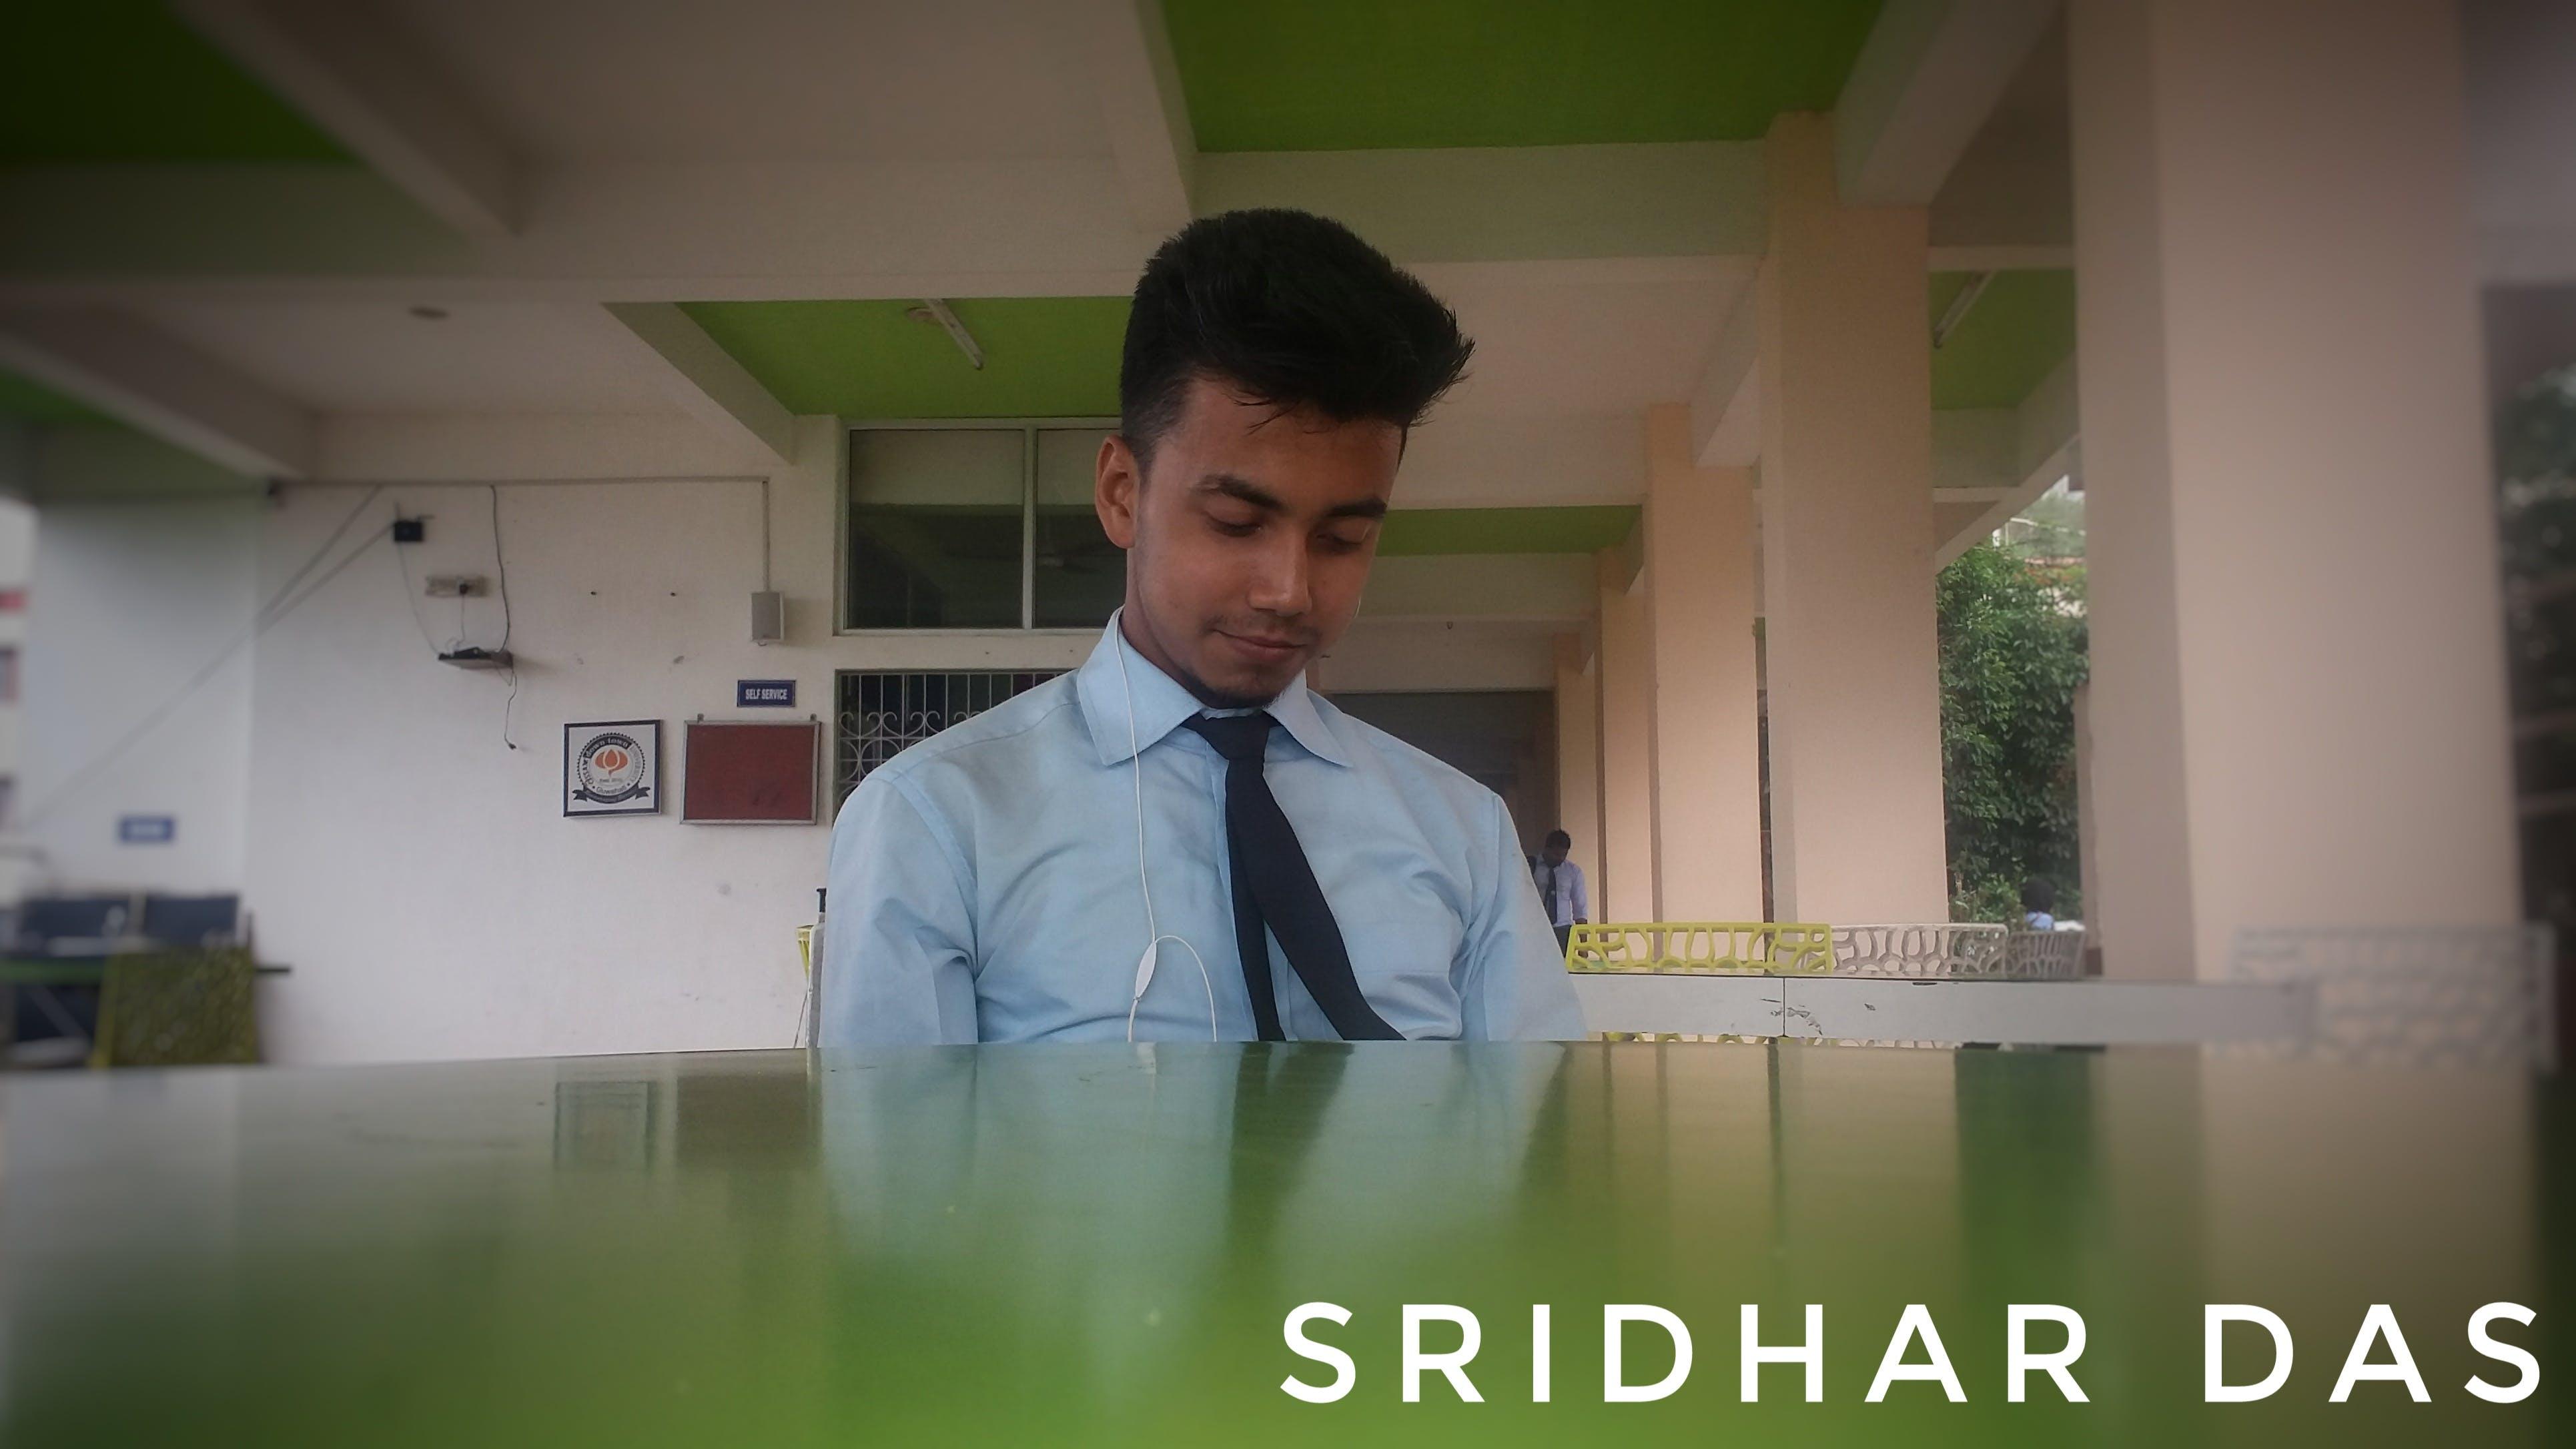 Free stock photo of SRIDHAR DAS